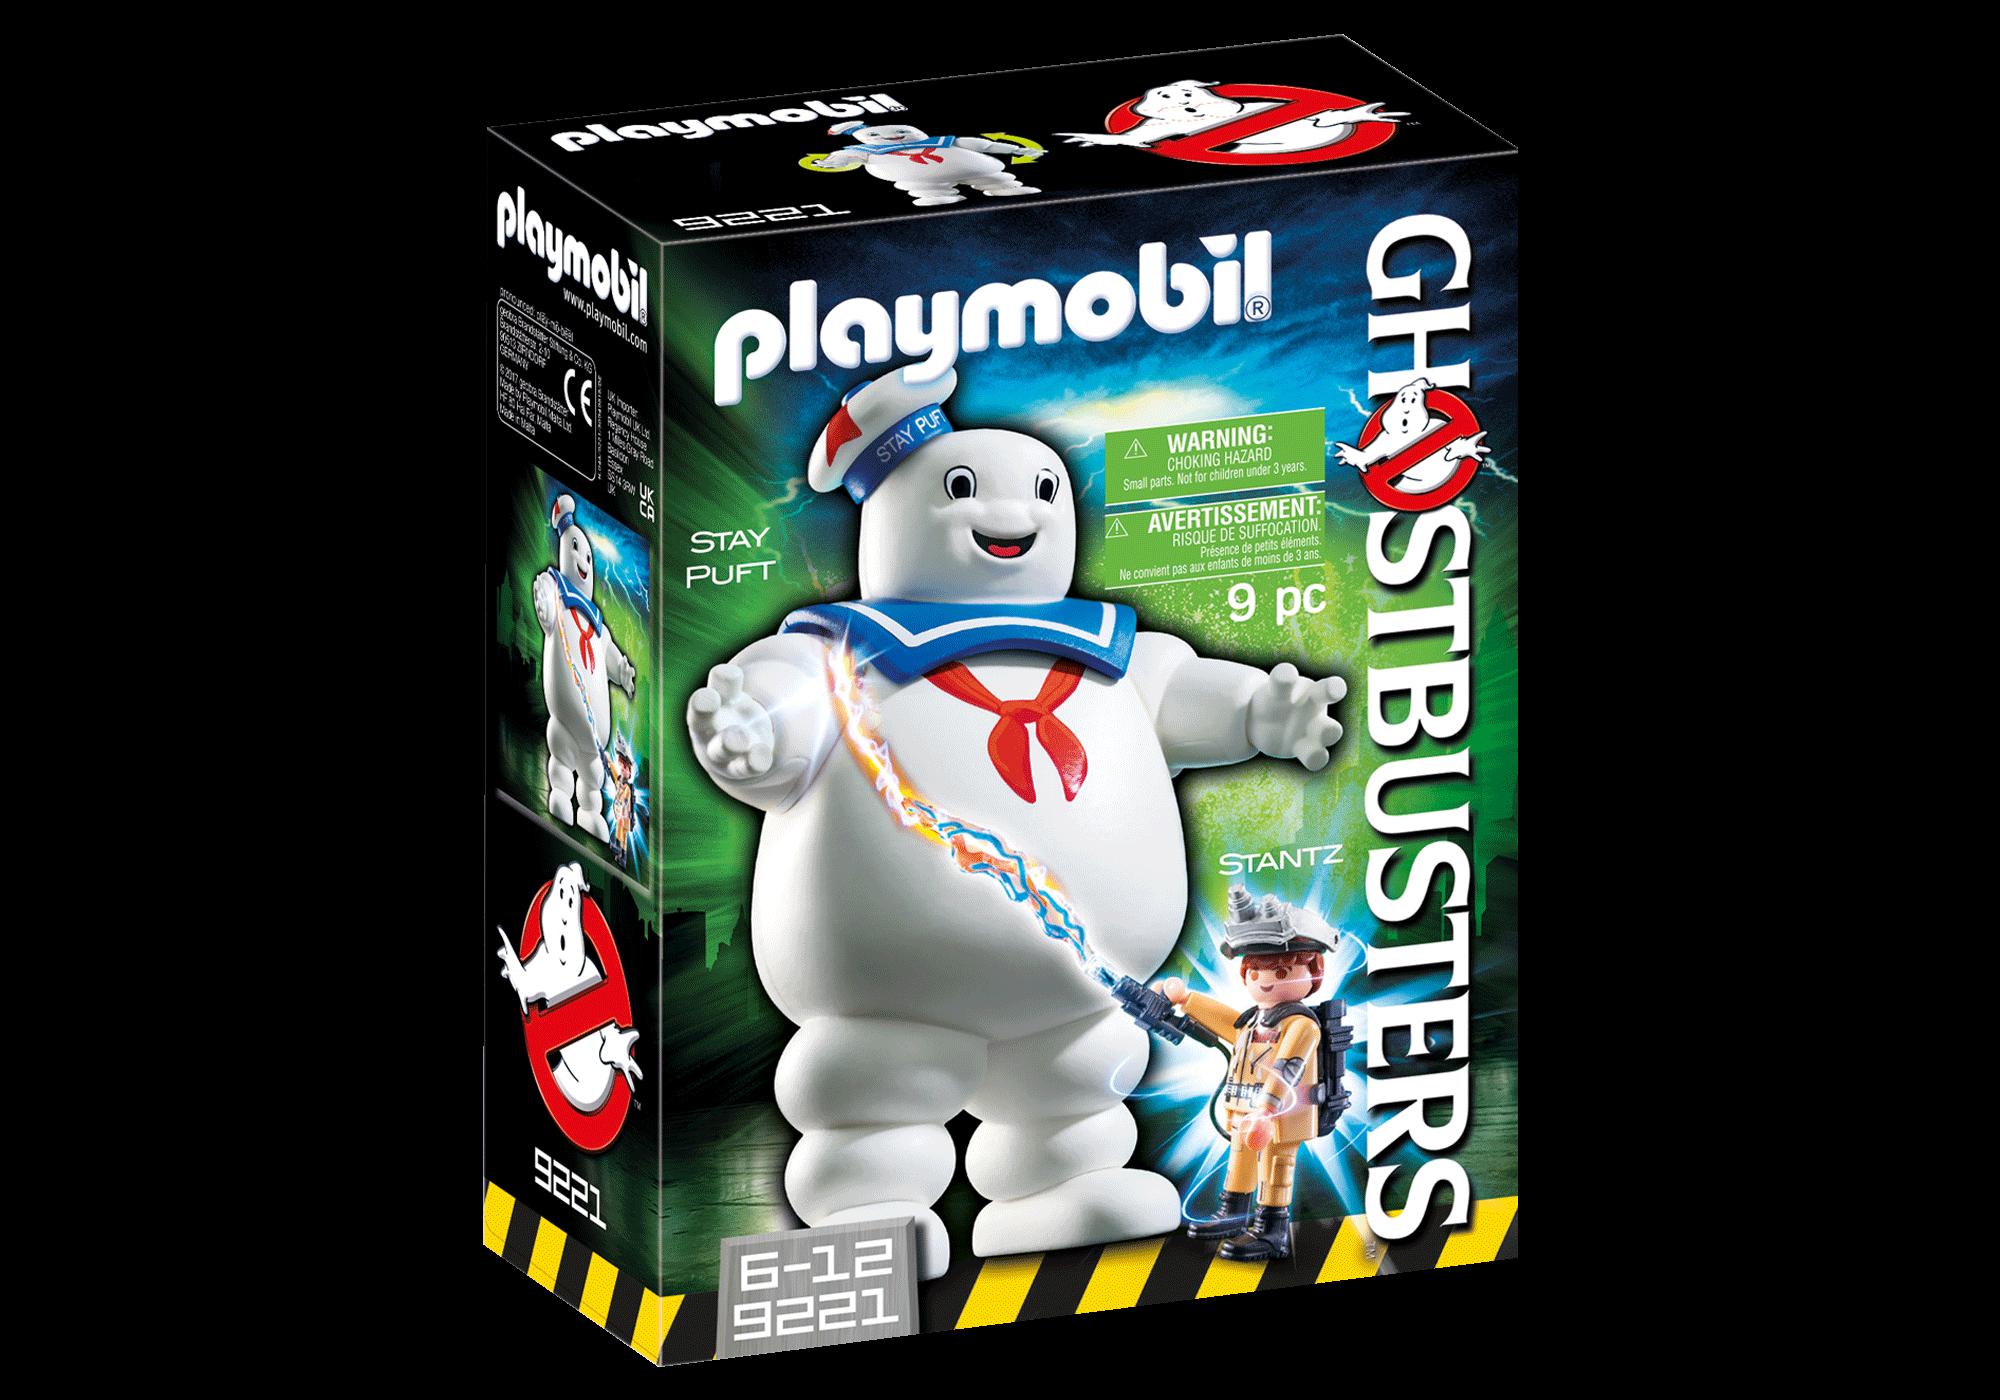 http://media.playmobil.com/i/playmobil/9221_product_box_front/Stay Puft Marshmallow Man